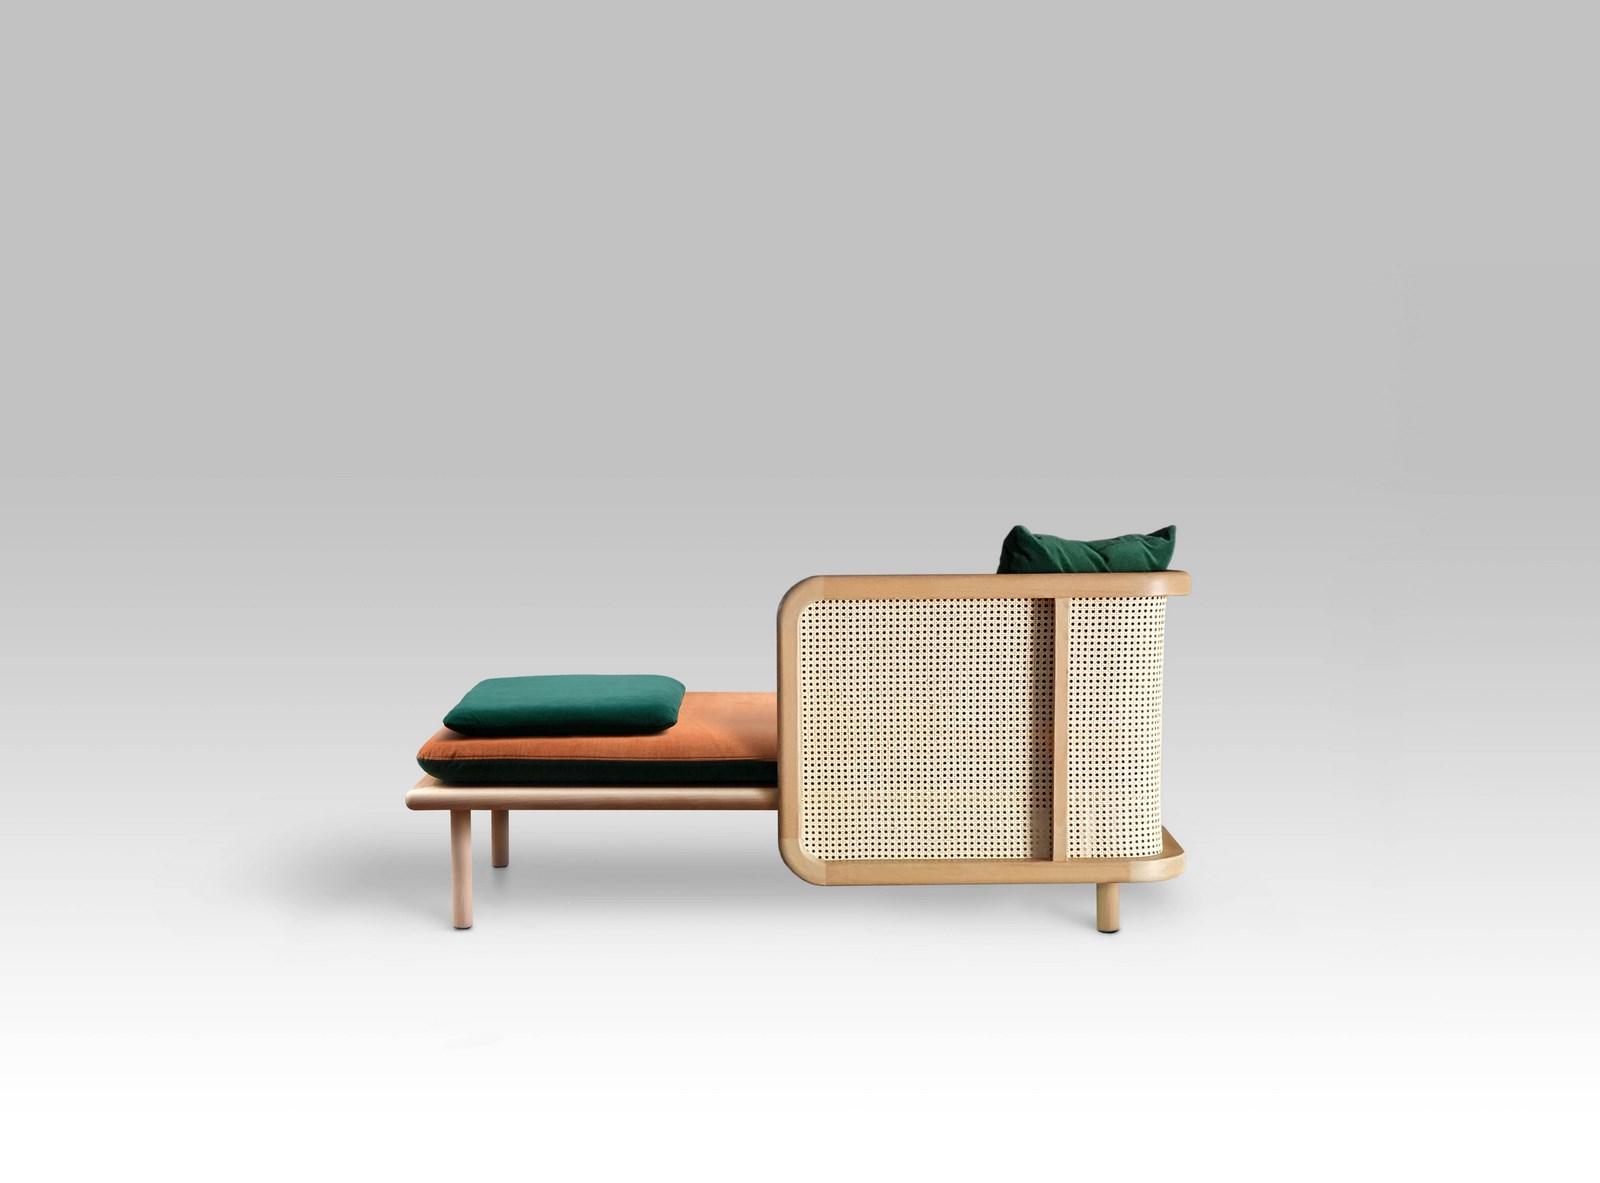 HUM_chaise-2 (Copy)